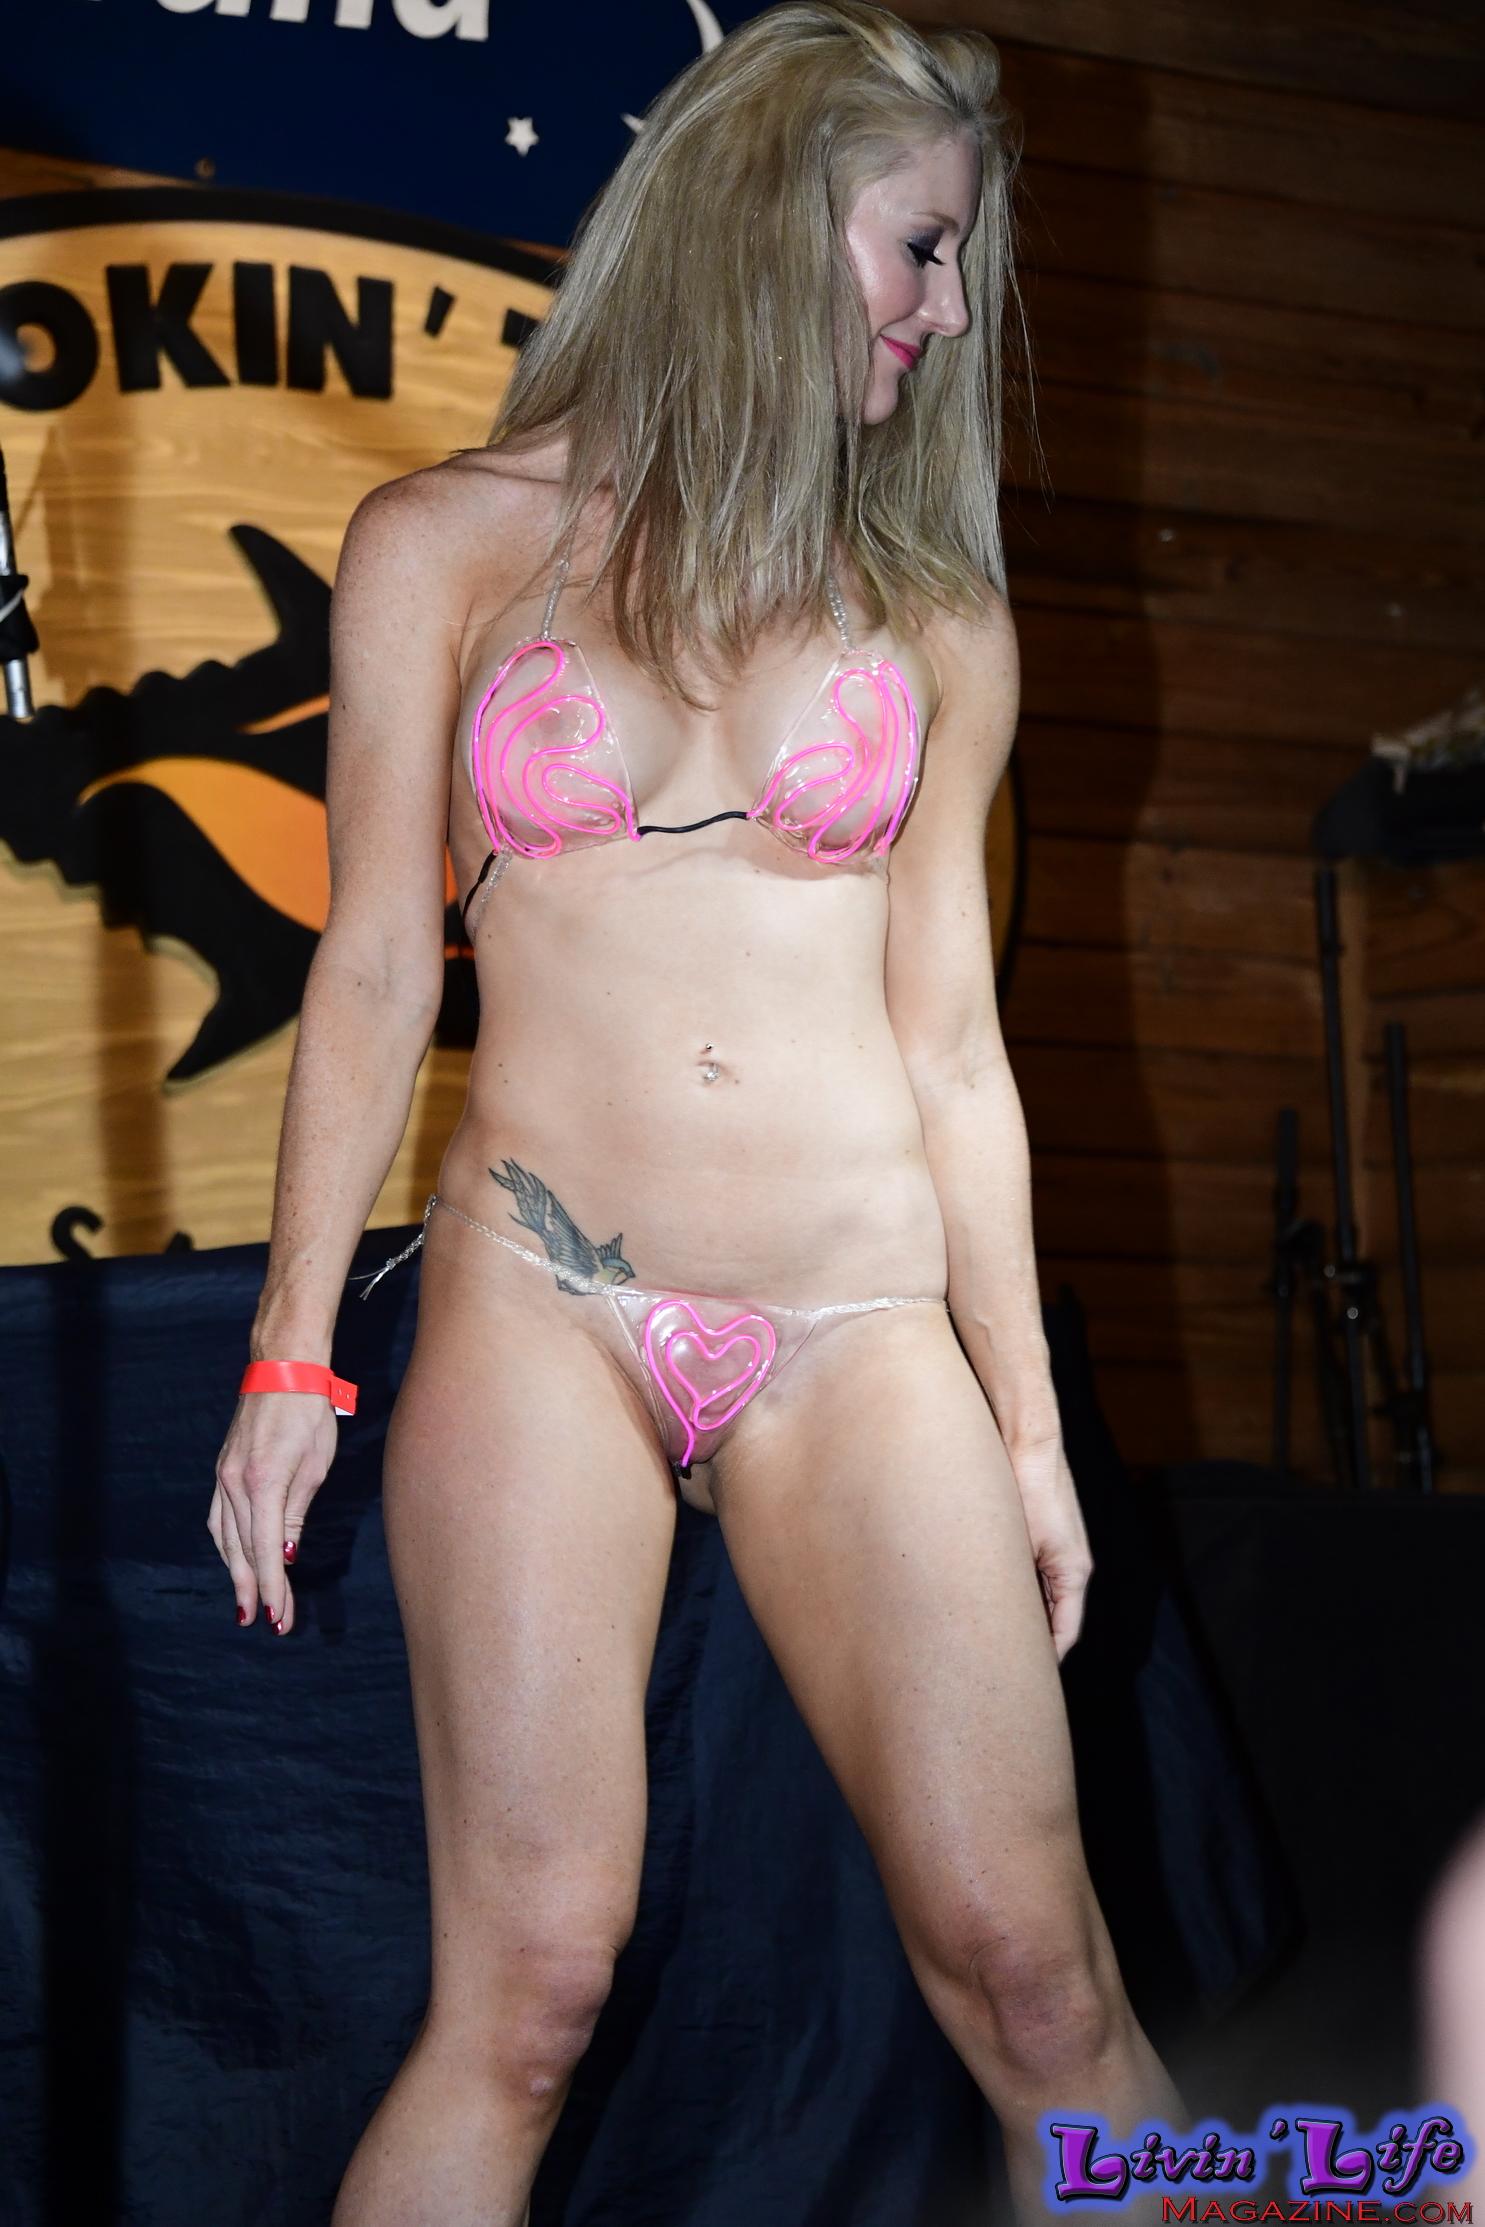 bikini monopoly Homemade contest